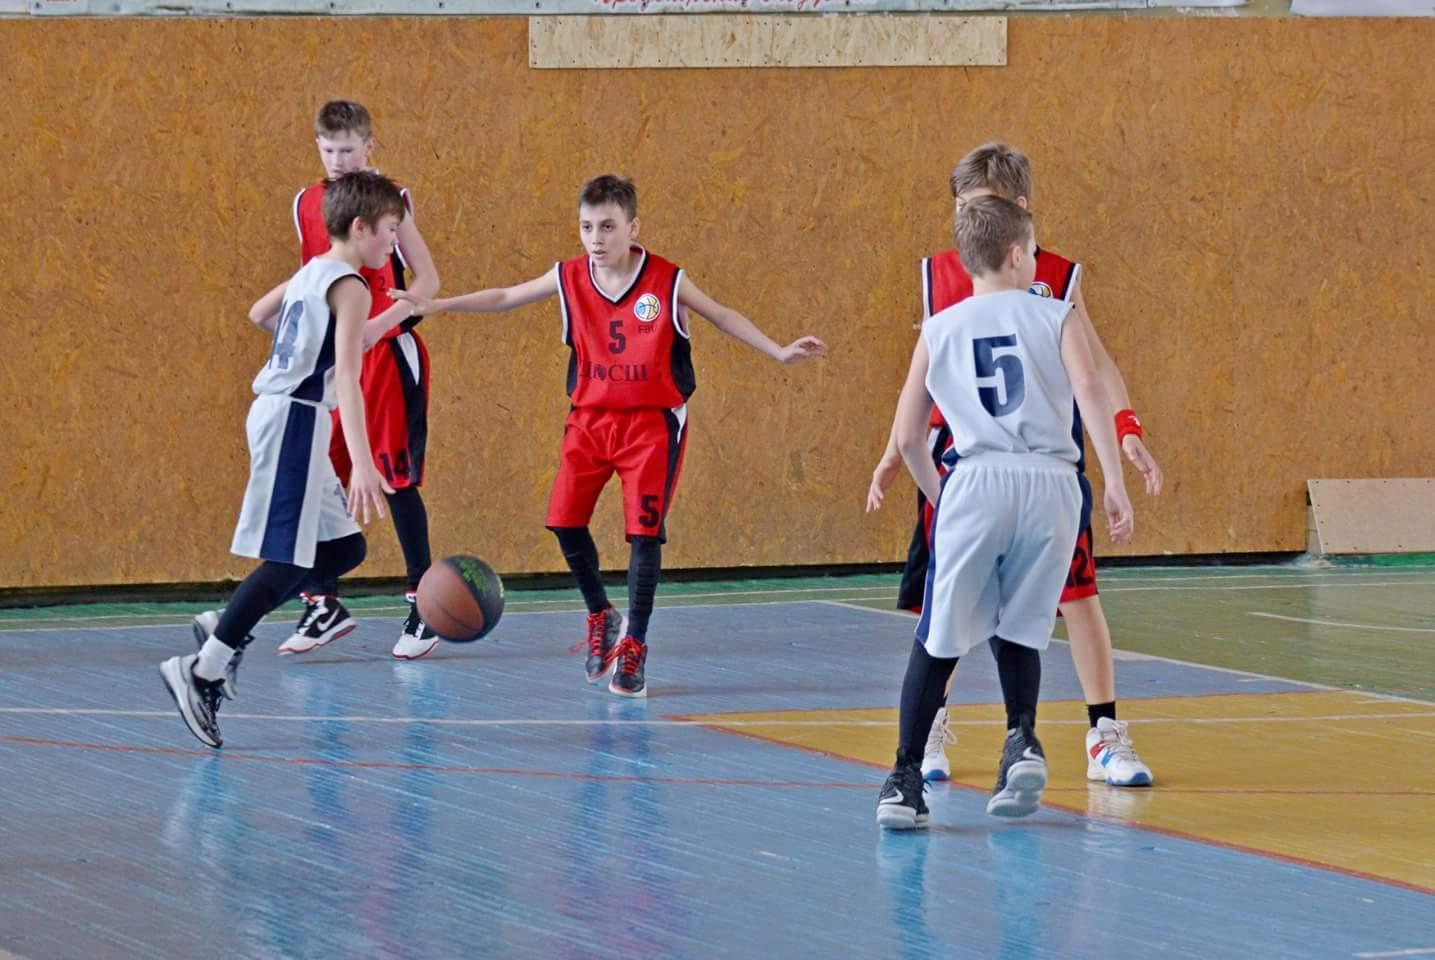 Баскетбольна вправа 3 на 3 Guts